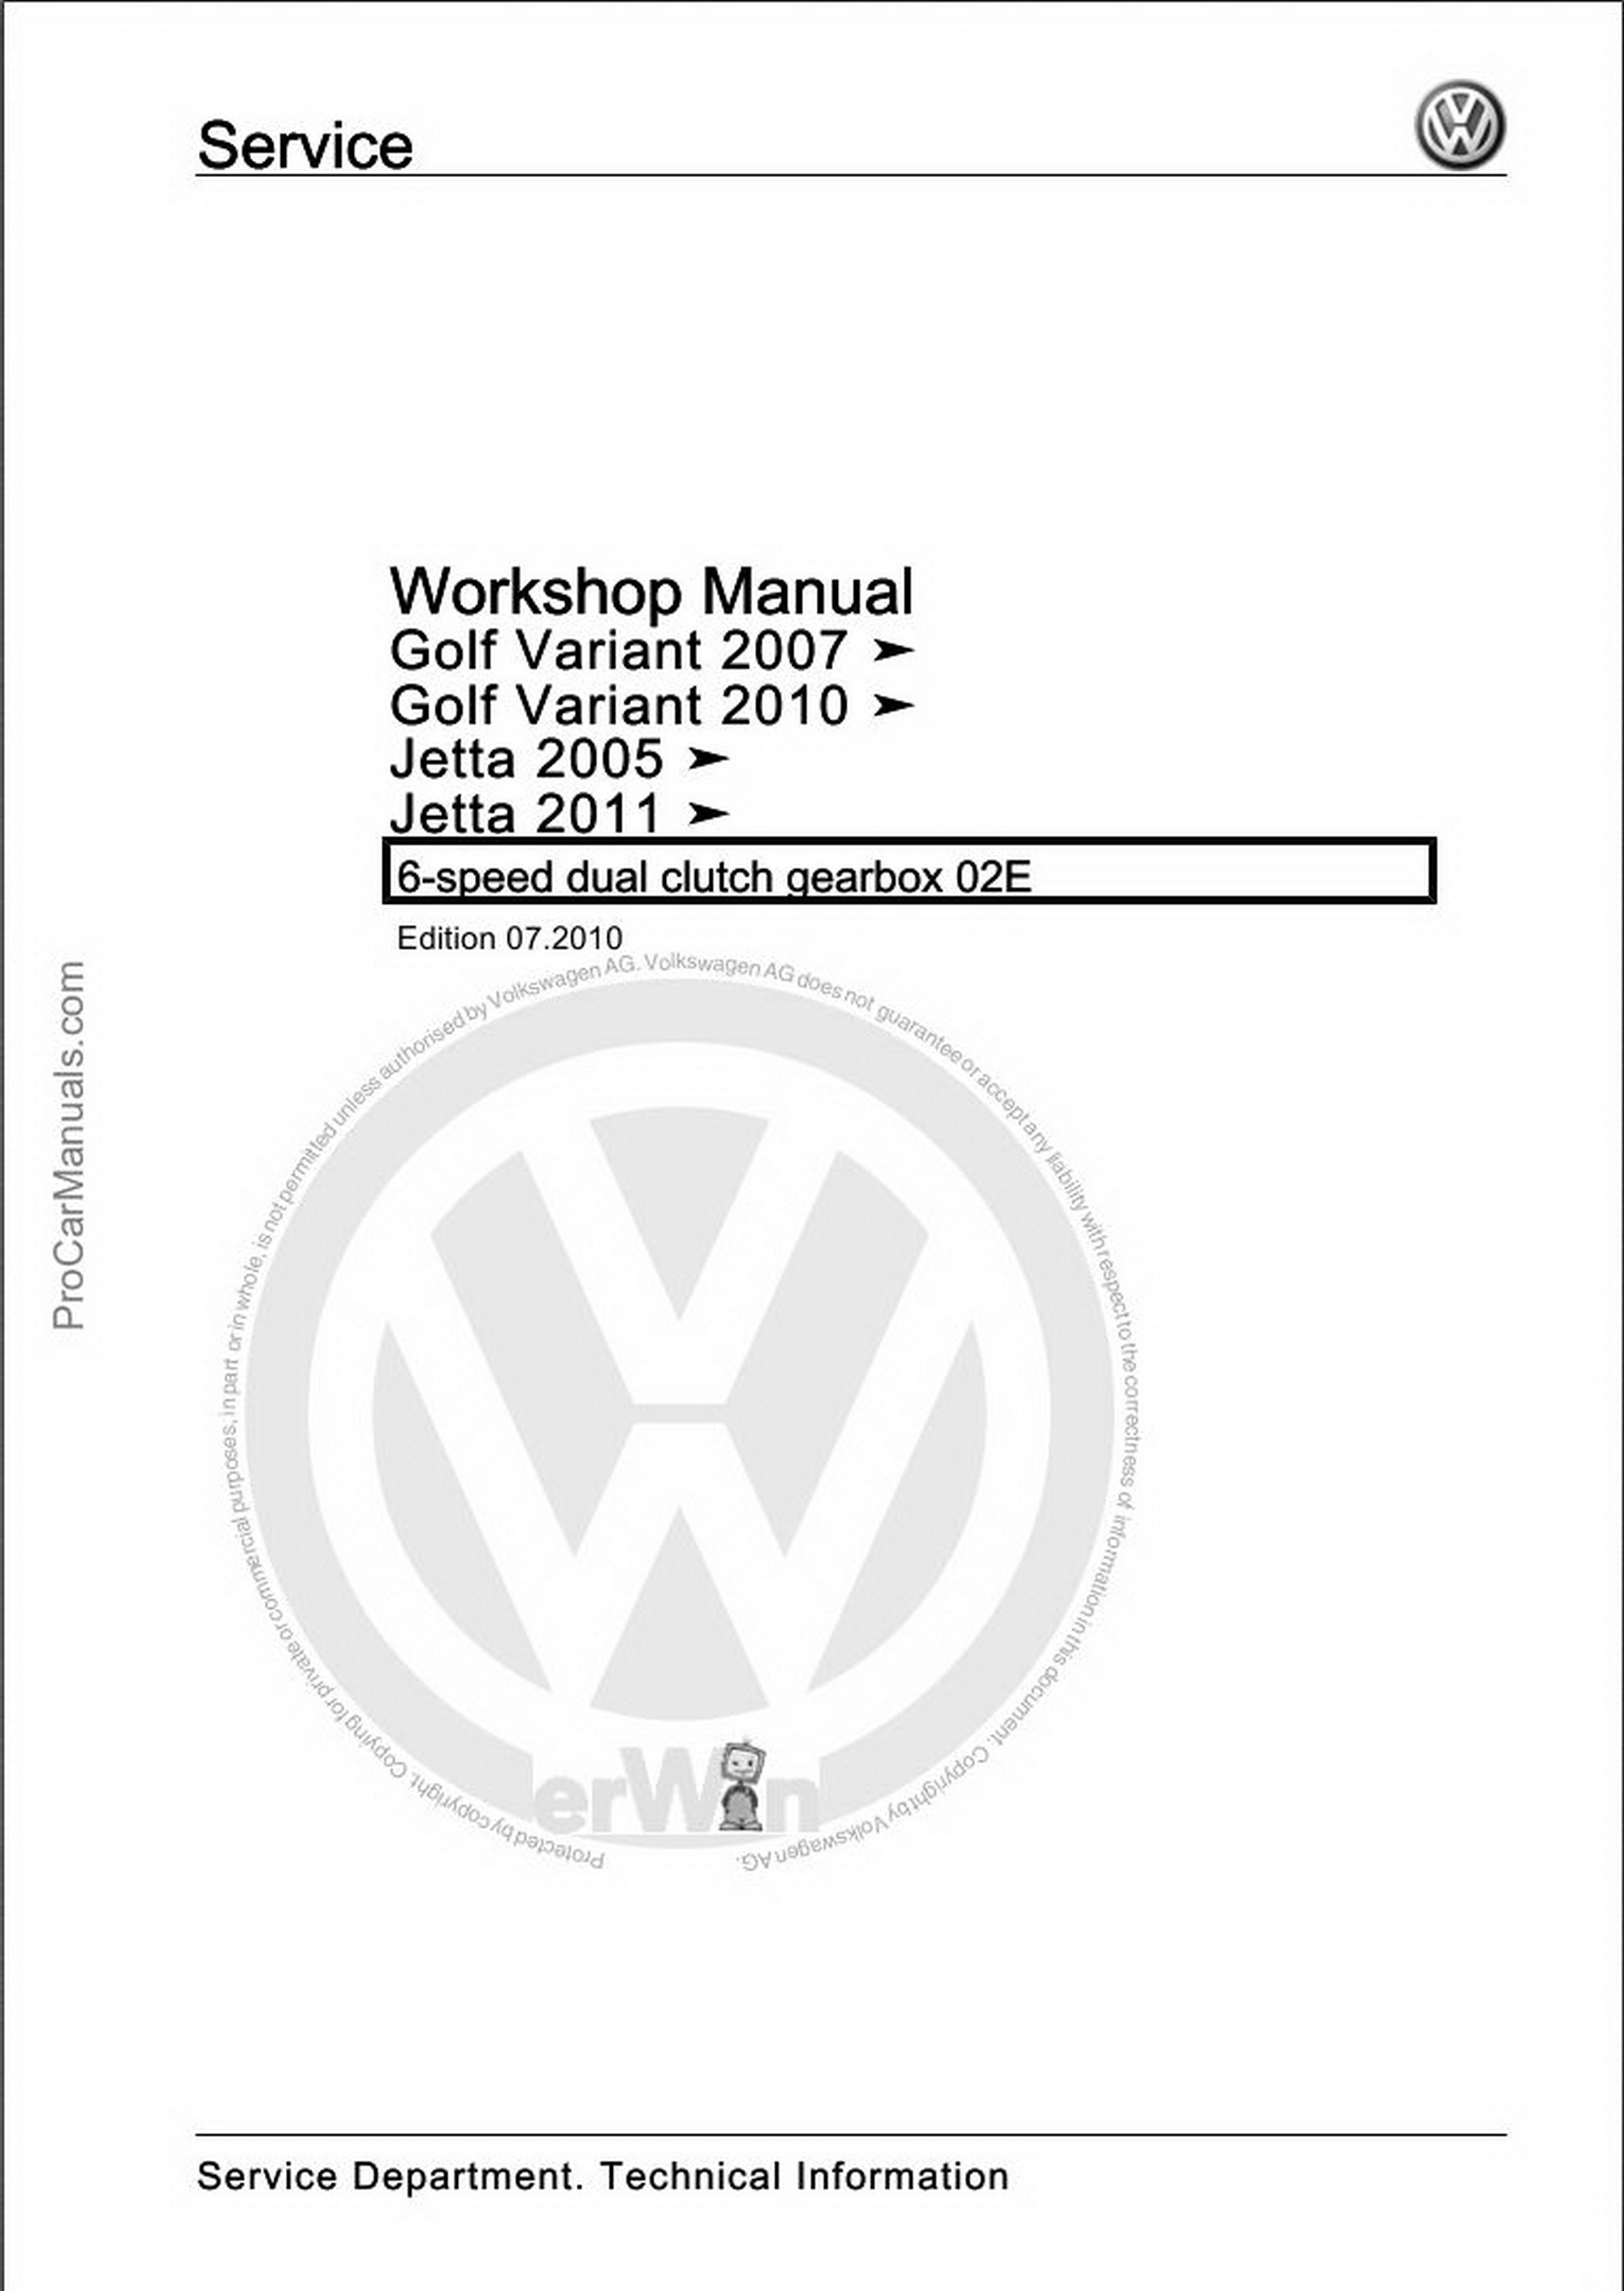 Volkswagen 6-speed Dual Clutch Gearbox 02E Workshop Manual